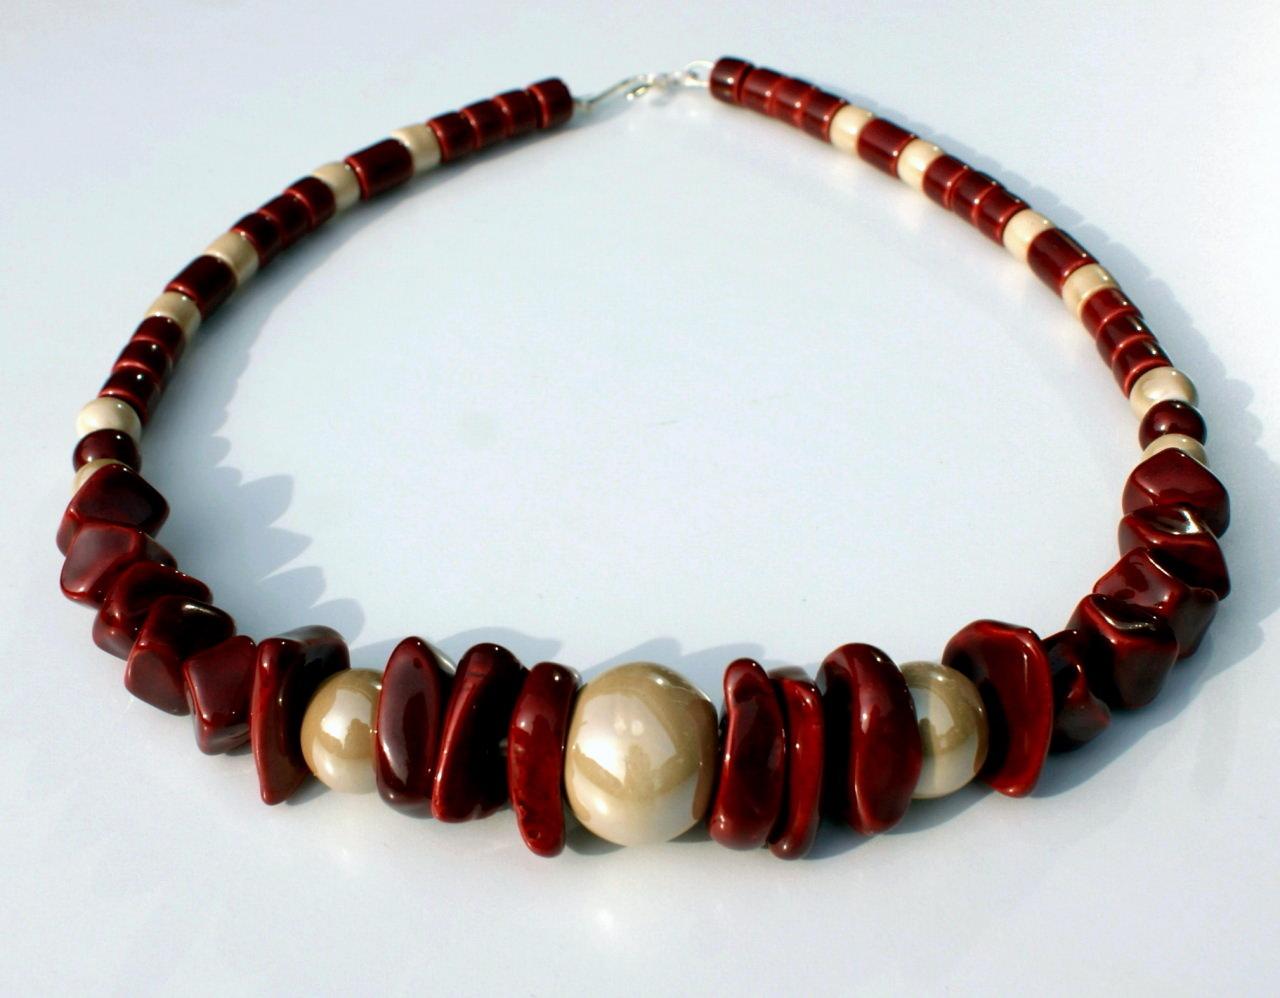 - Collier ROT-SAND griechische Keramik Leder opulent leicht  - Collier ROT-SAND griechische Keramik Leder opulent leicht